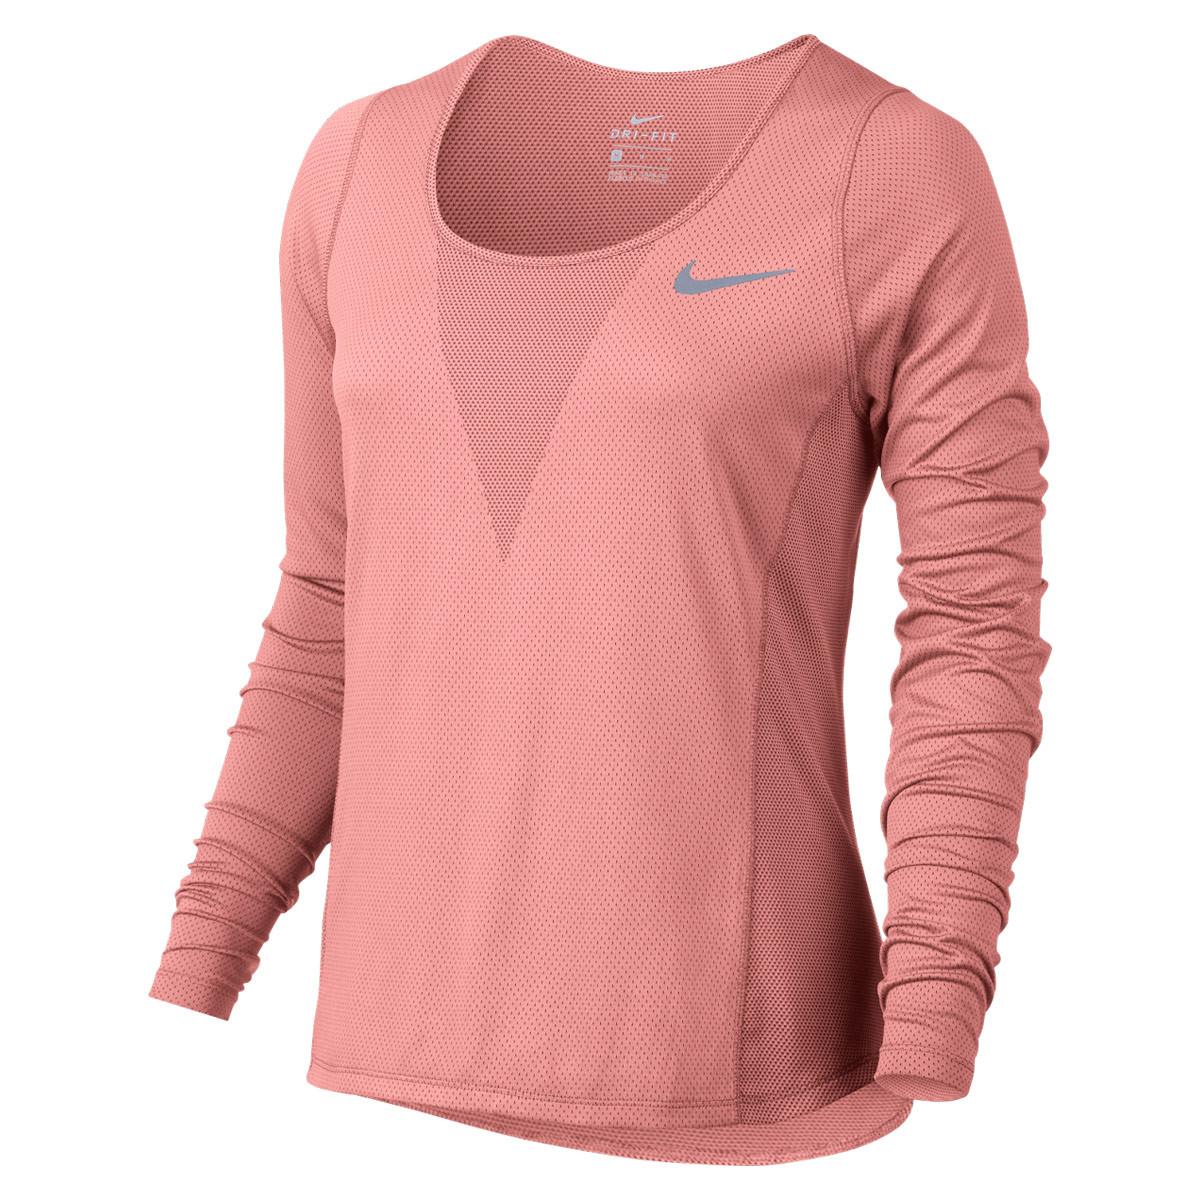 ccec1559b Nike Zonal Cooling Relay Running Longsleeve - Running tops for Women - Red  | 21RUN